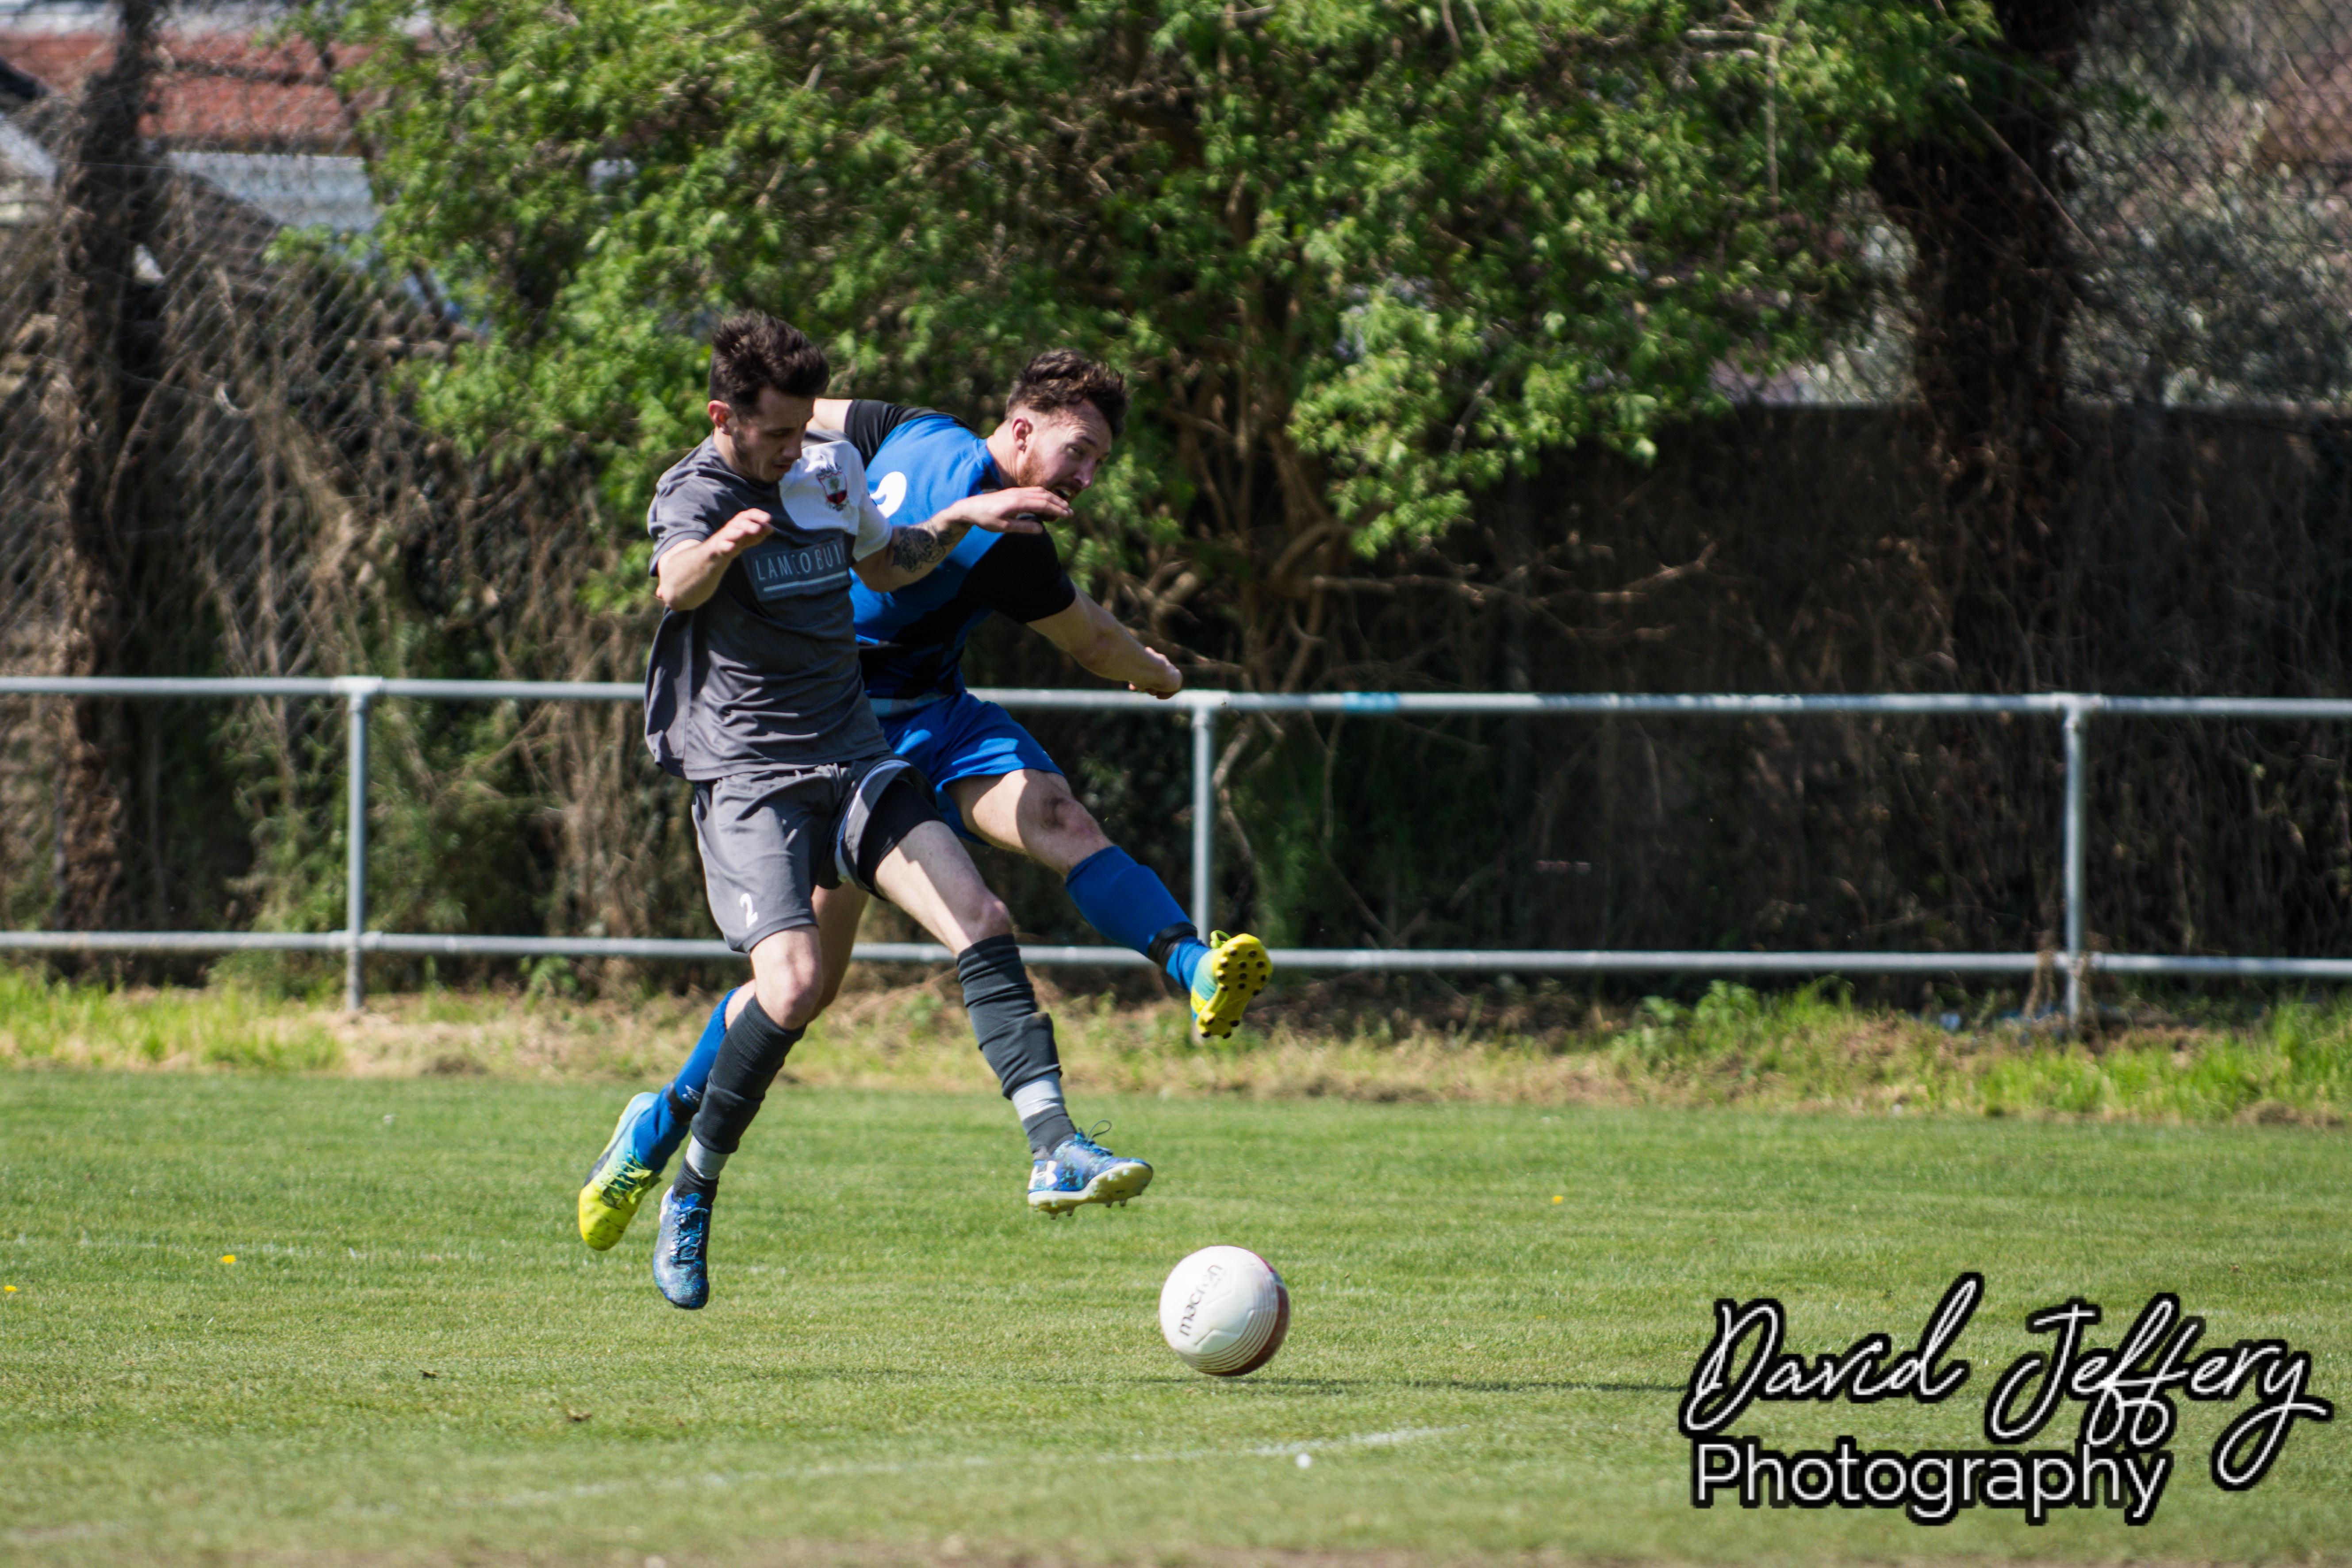 046 Steyn vs Wick, Div1 Cup Final DAVID_